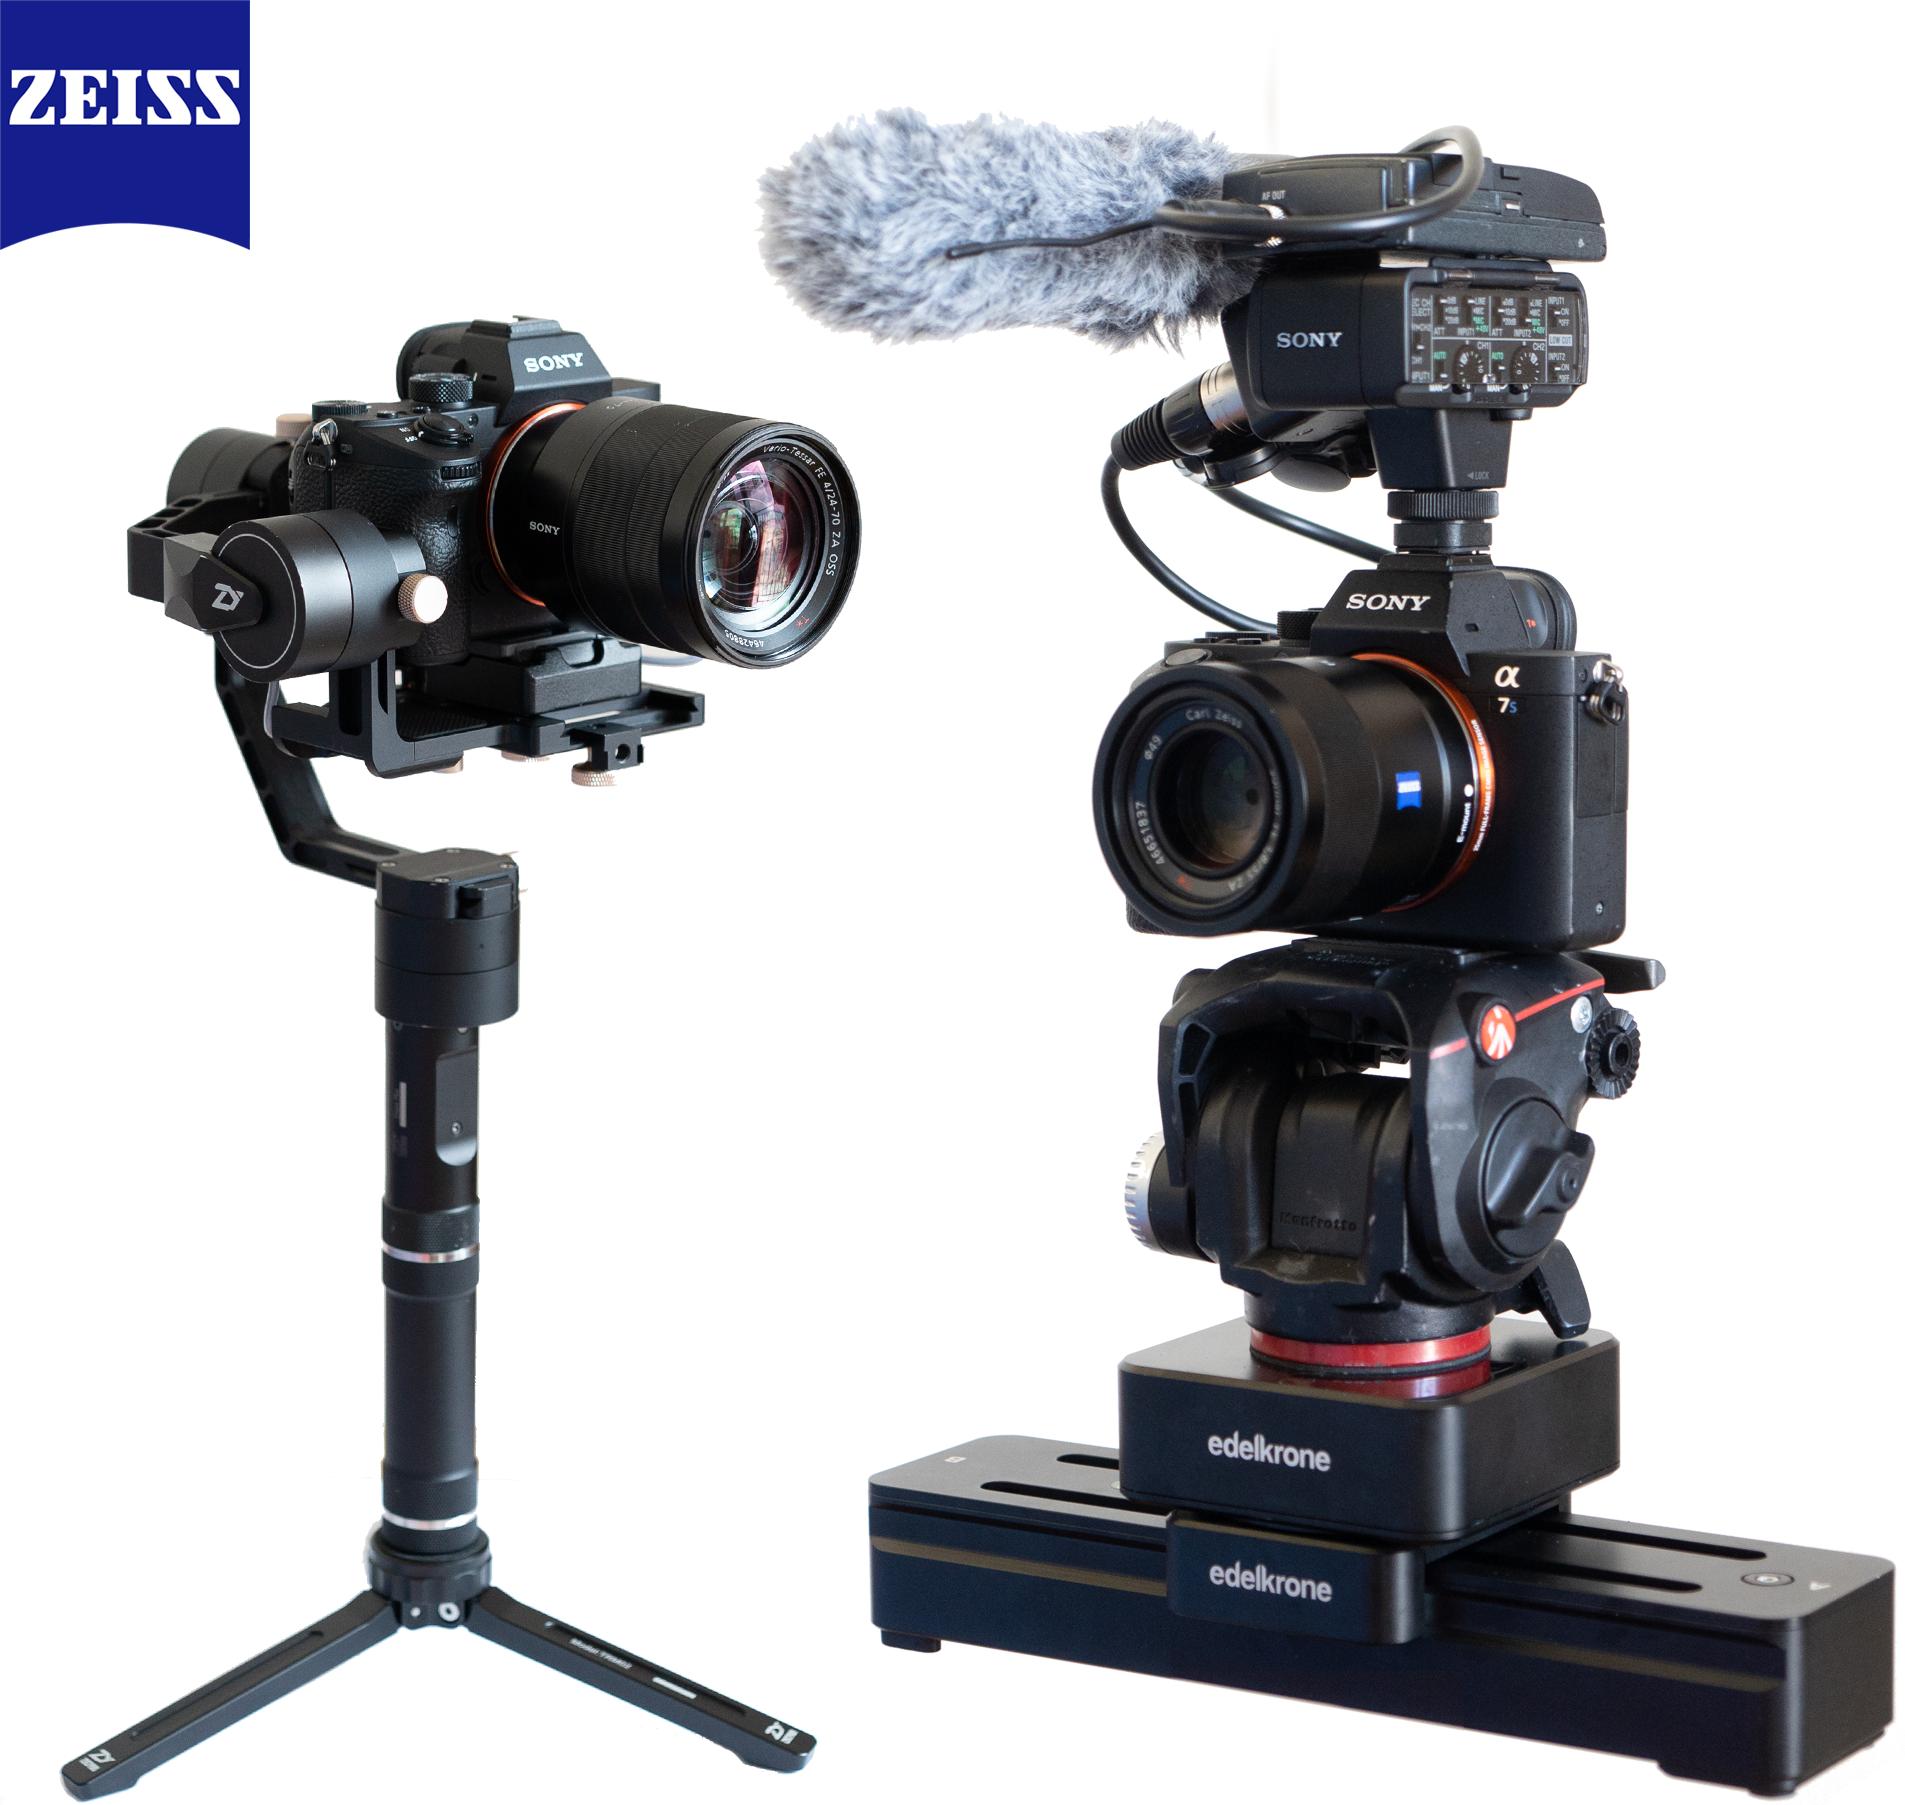 Sony a7s II and a7 III Shooting Kit